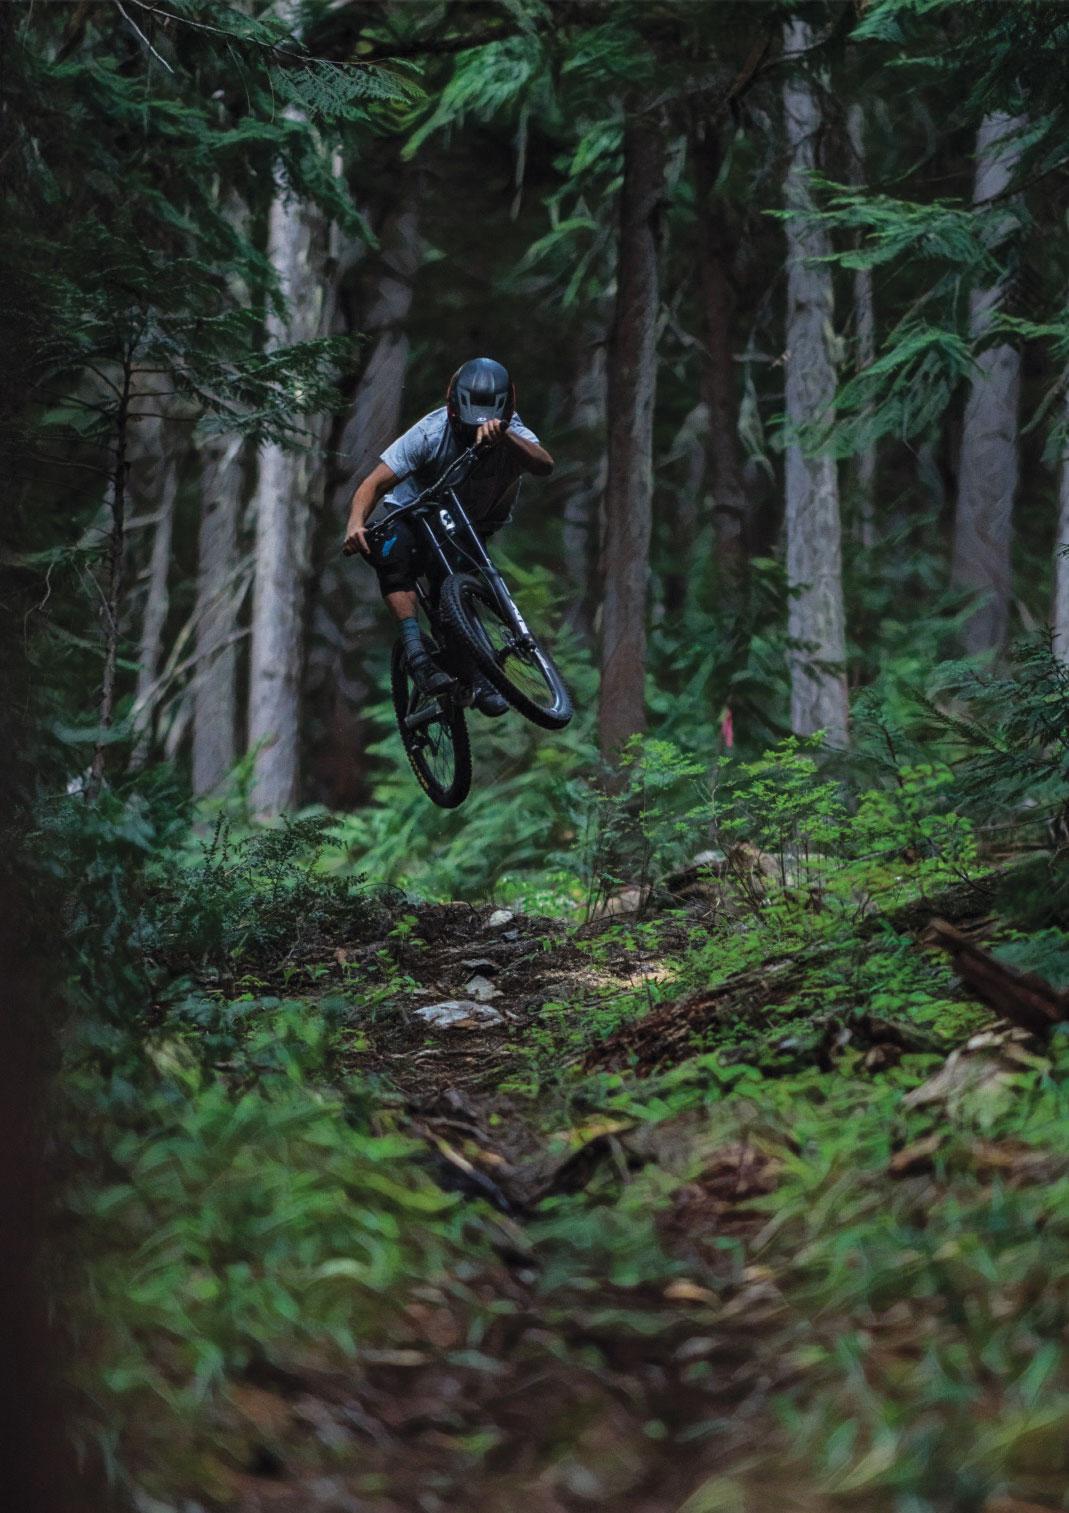 Half day shuttle, Vertical mountain biking, Kootenays. Epic days.